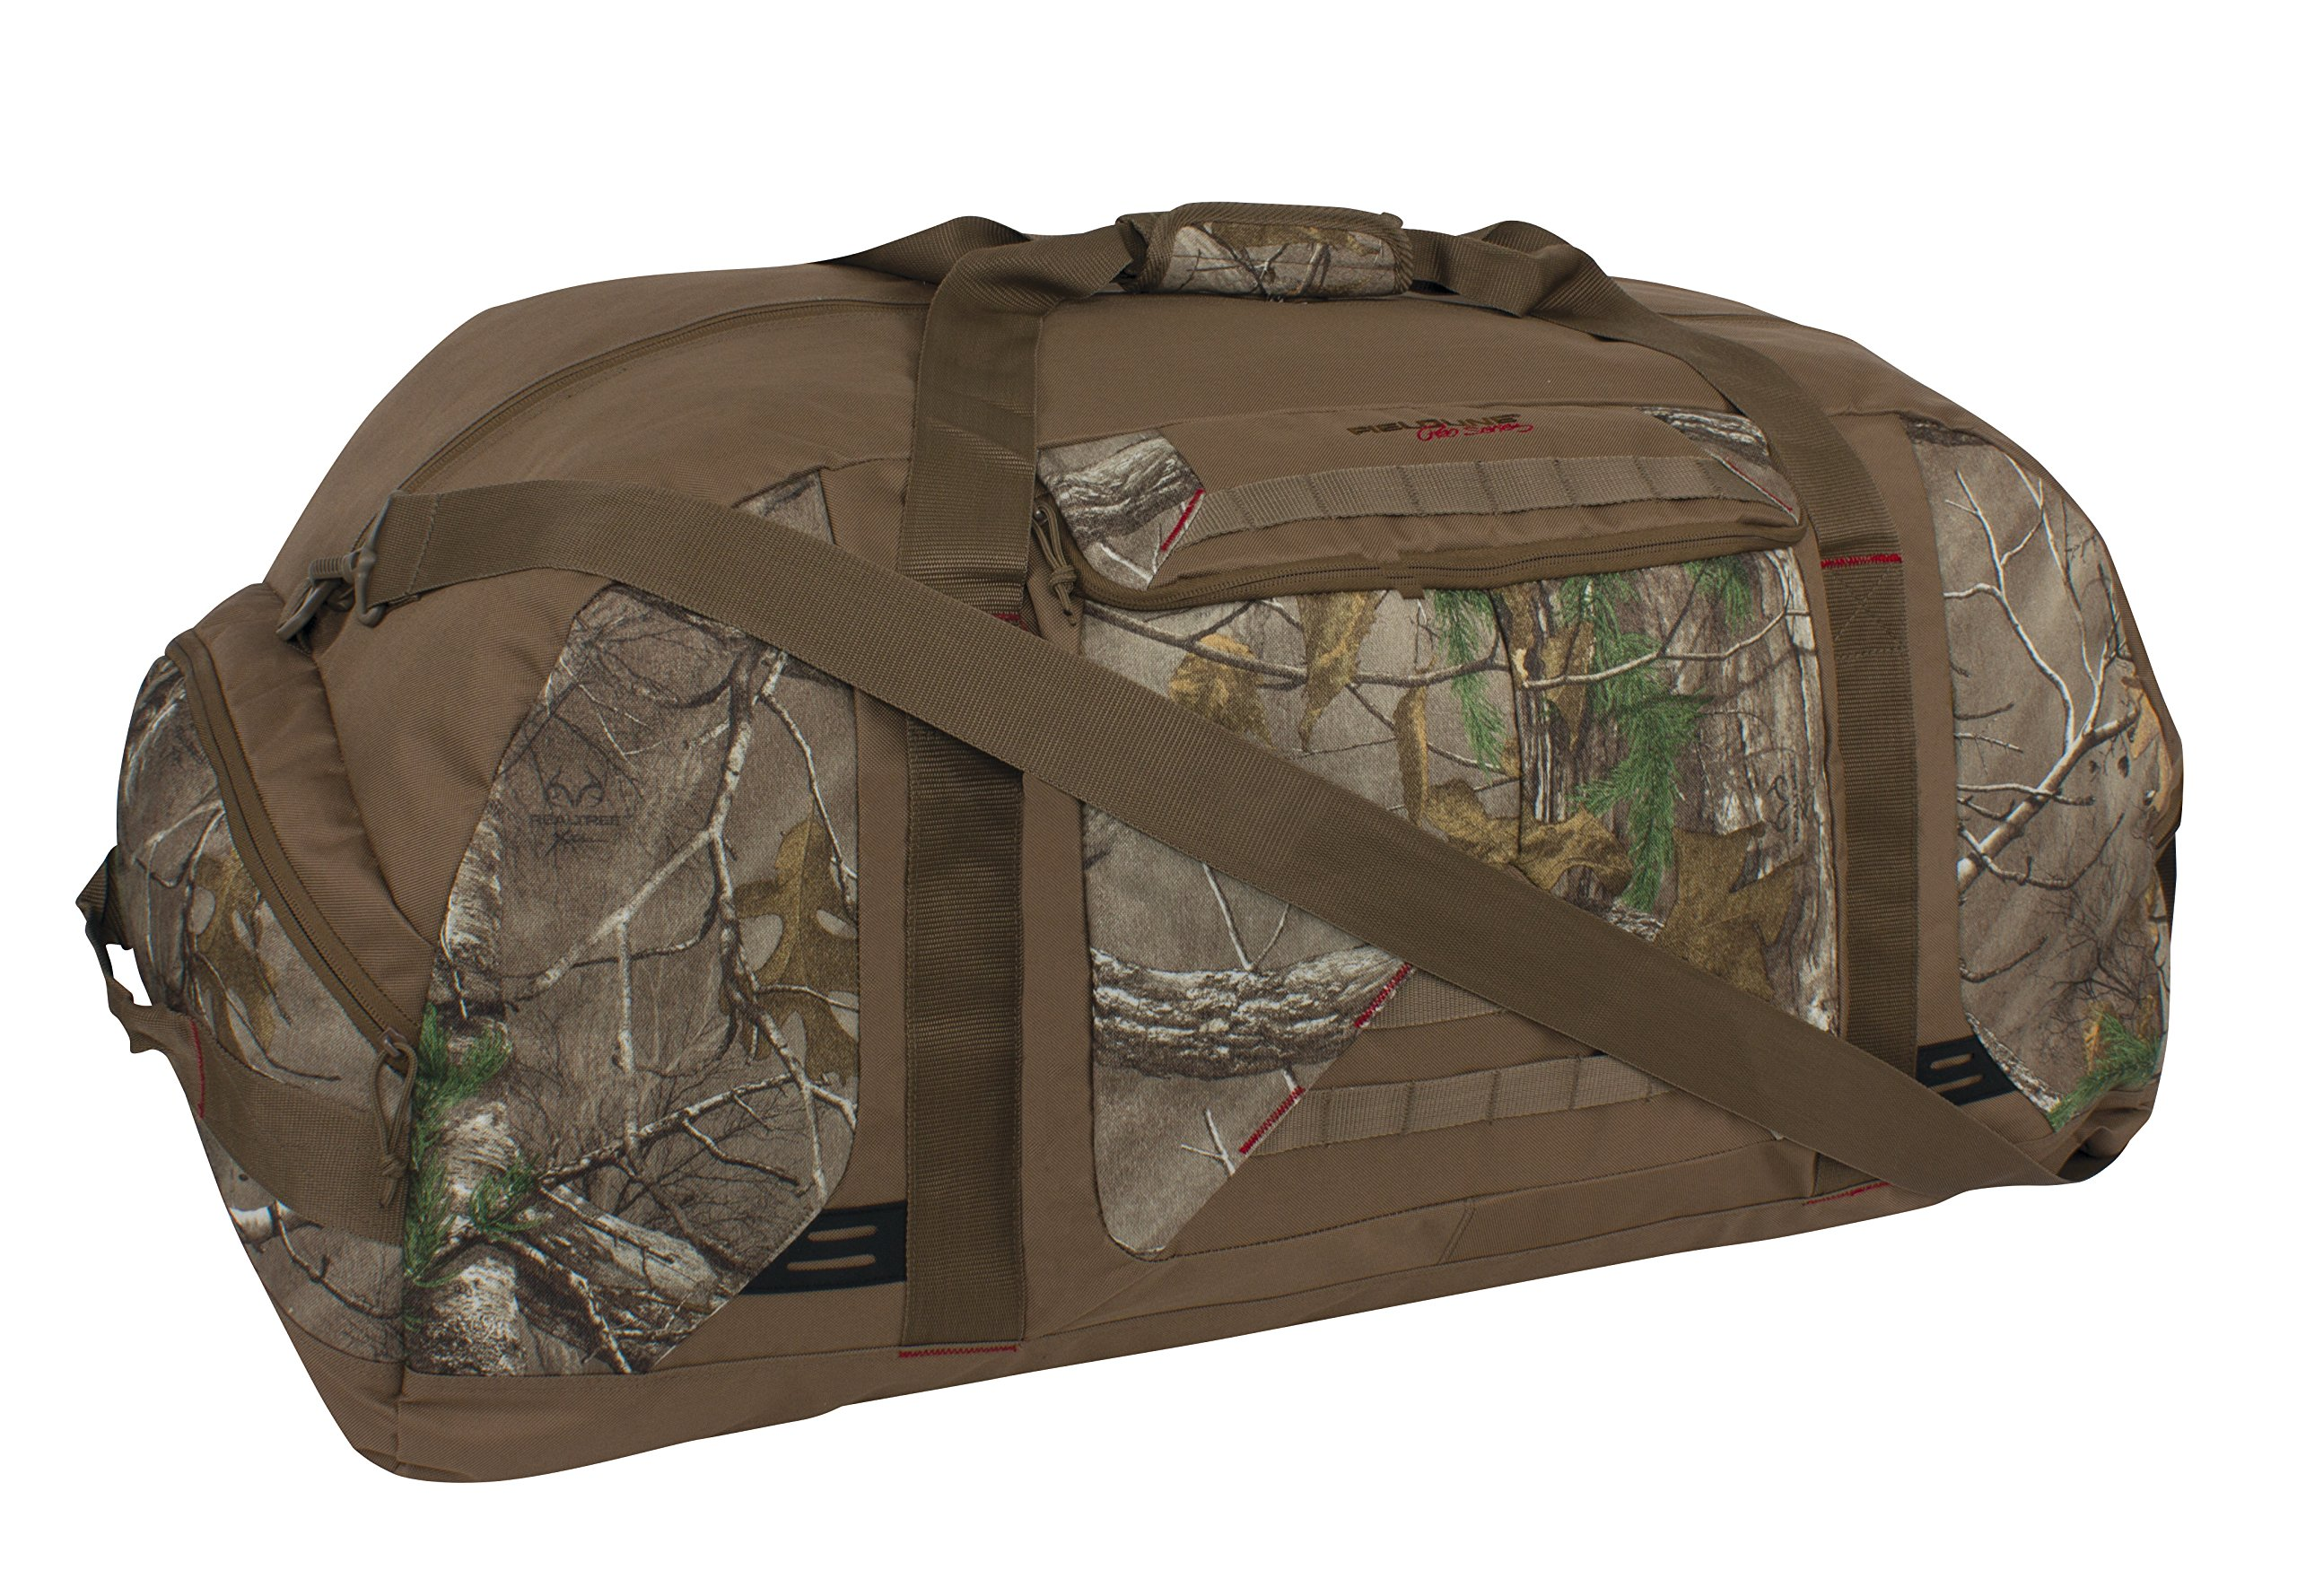 Fieldline Pro Ultimate Duffle Bag, Extra-Large, RealTree Xtra